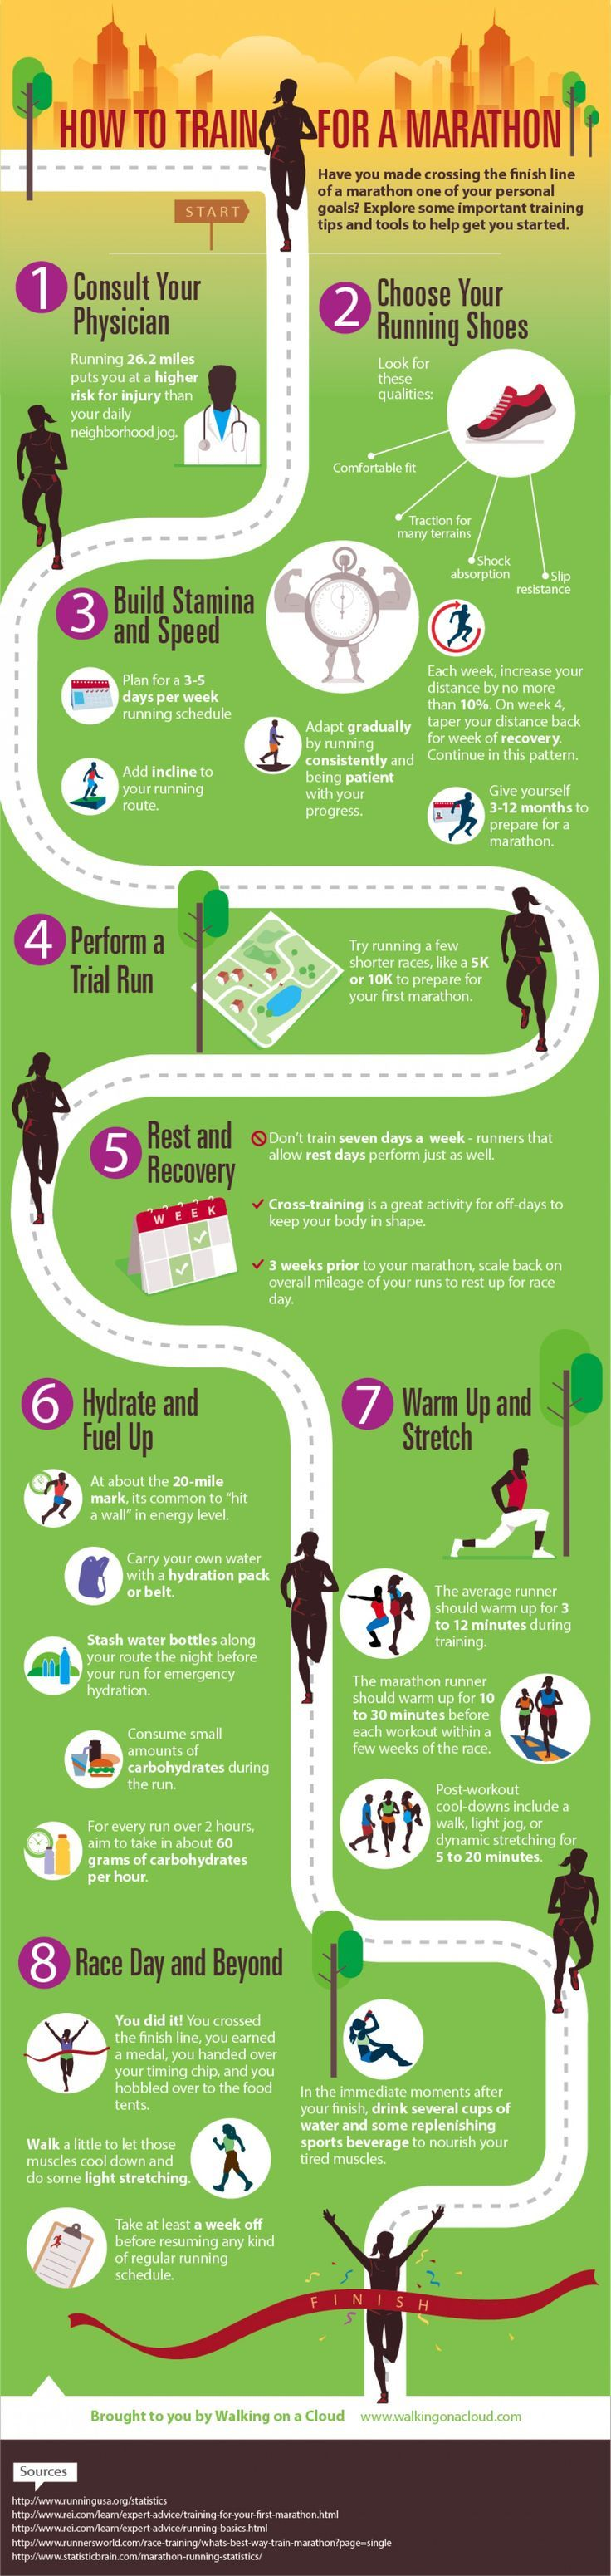 Training for Marathon http://makeyourbodywork.com/why-exercise-is-awesome/ #marathon #training #running